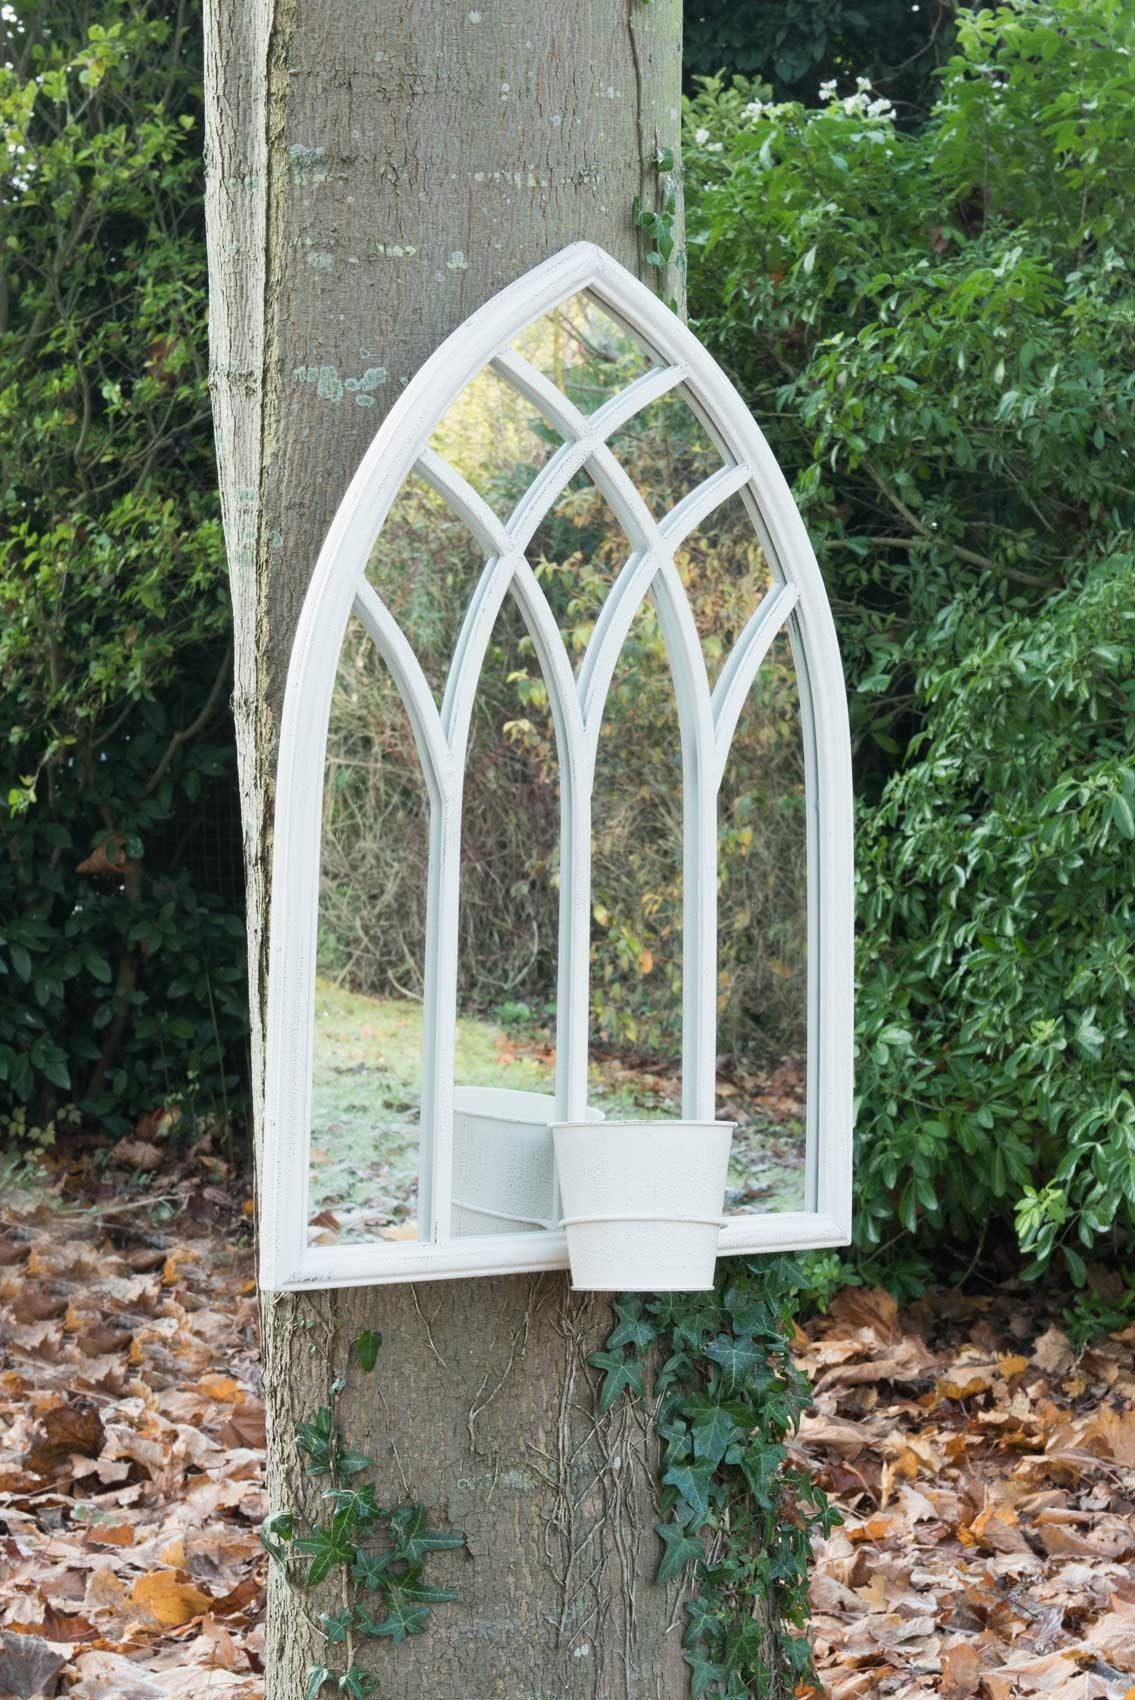 Large Outdoor Garden Mirror White Gothic Design 2ft5 X 1ft8 75cm Inside Large Outdoor Garden Mirrors (Image 7 of 15)